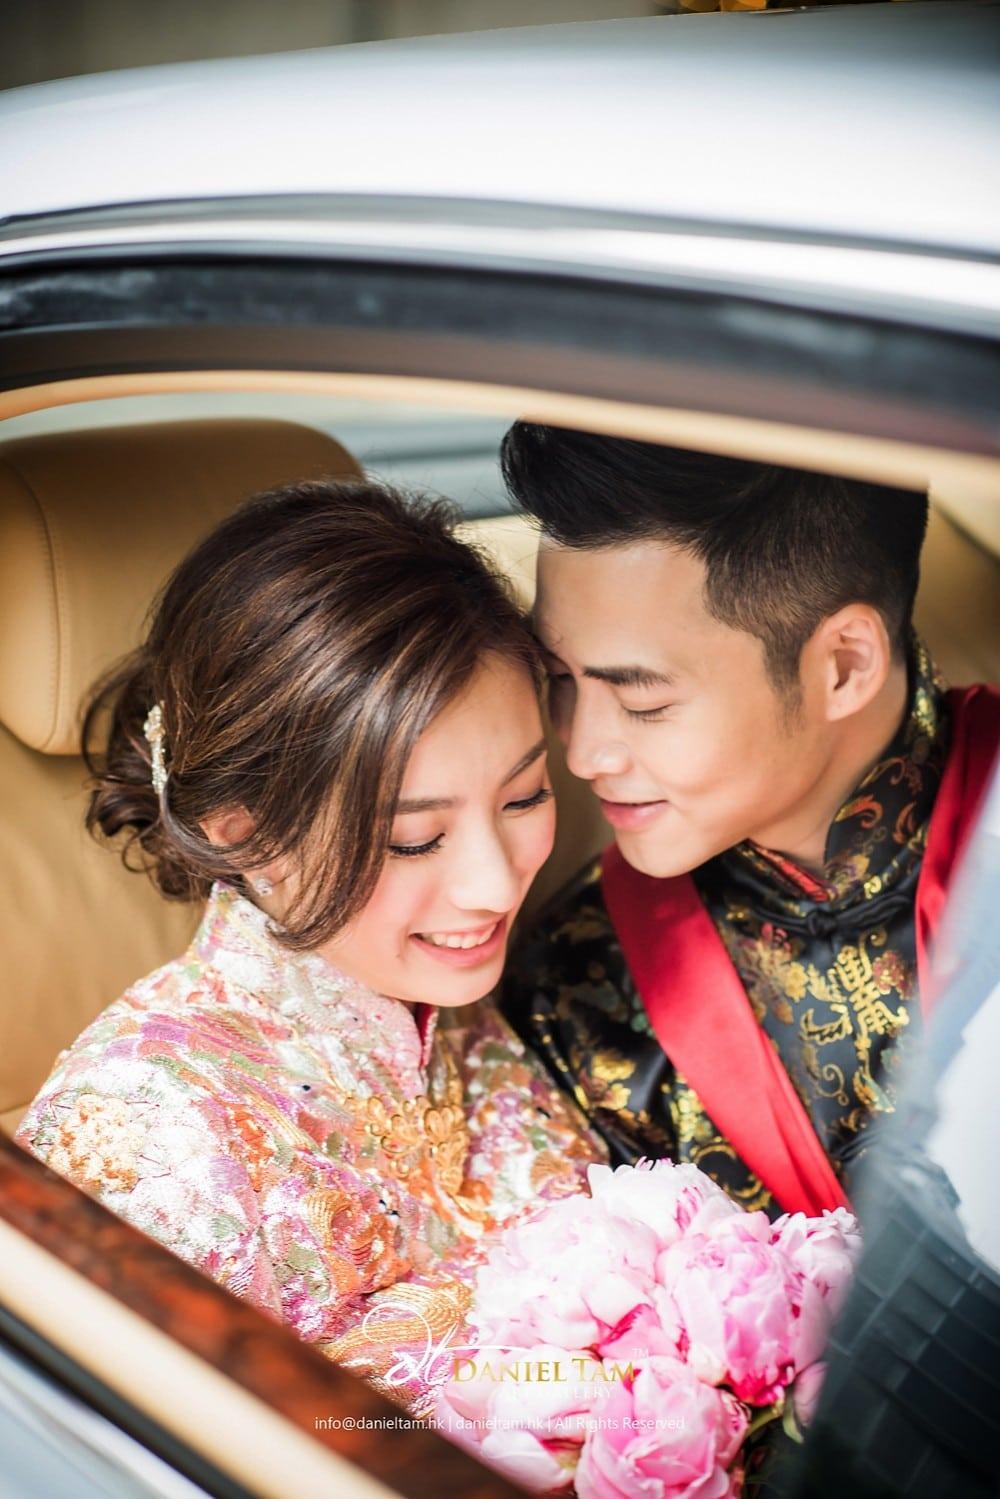 wedding-day-photography-hk-four-seasons-jessica-erik-01wedding-day-photography-hk-four-seasons-jessica-erik-11